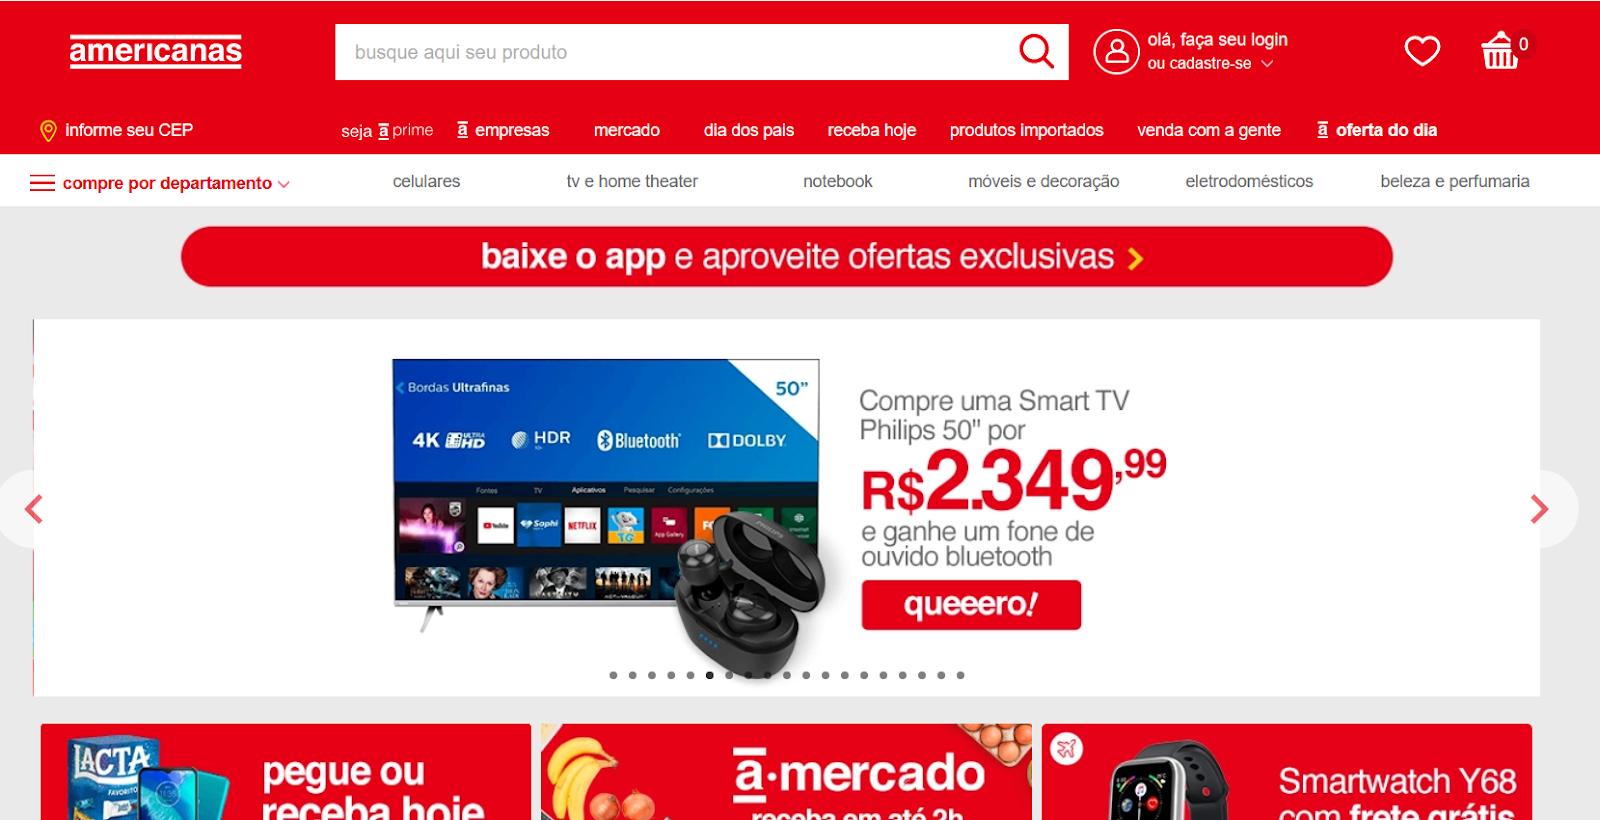 top e-commerce sites in Brazil americanas